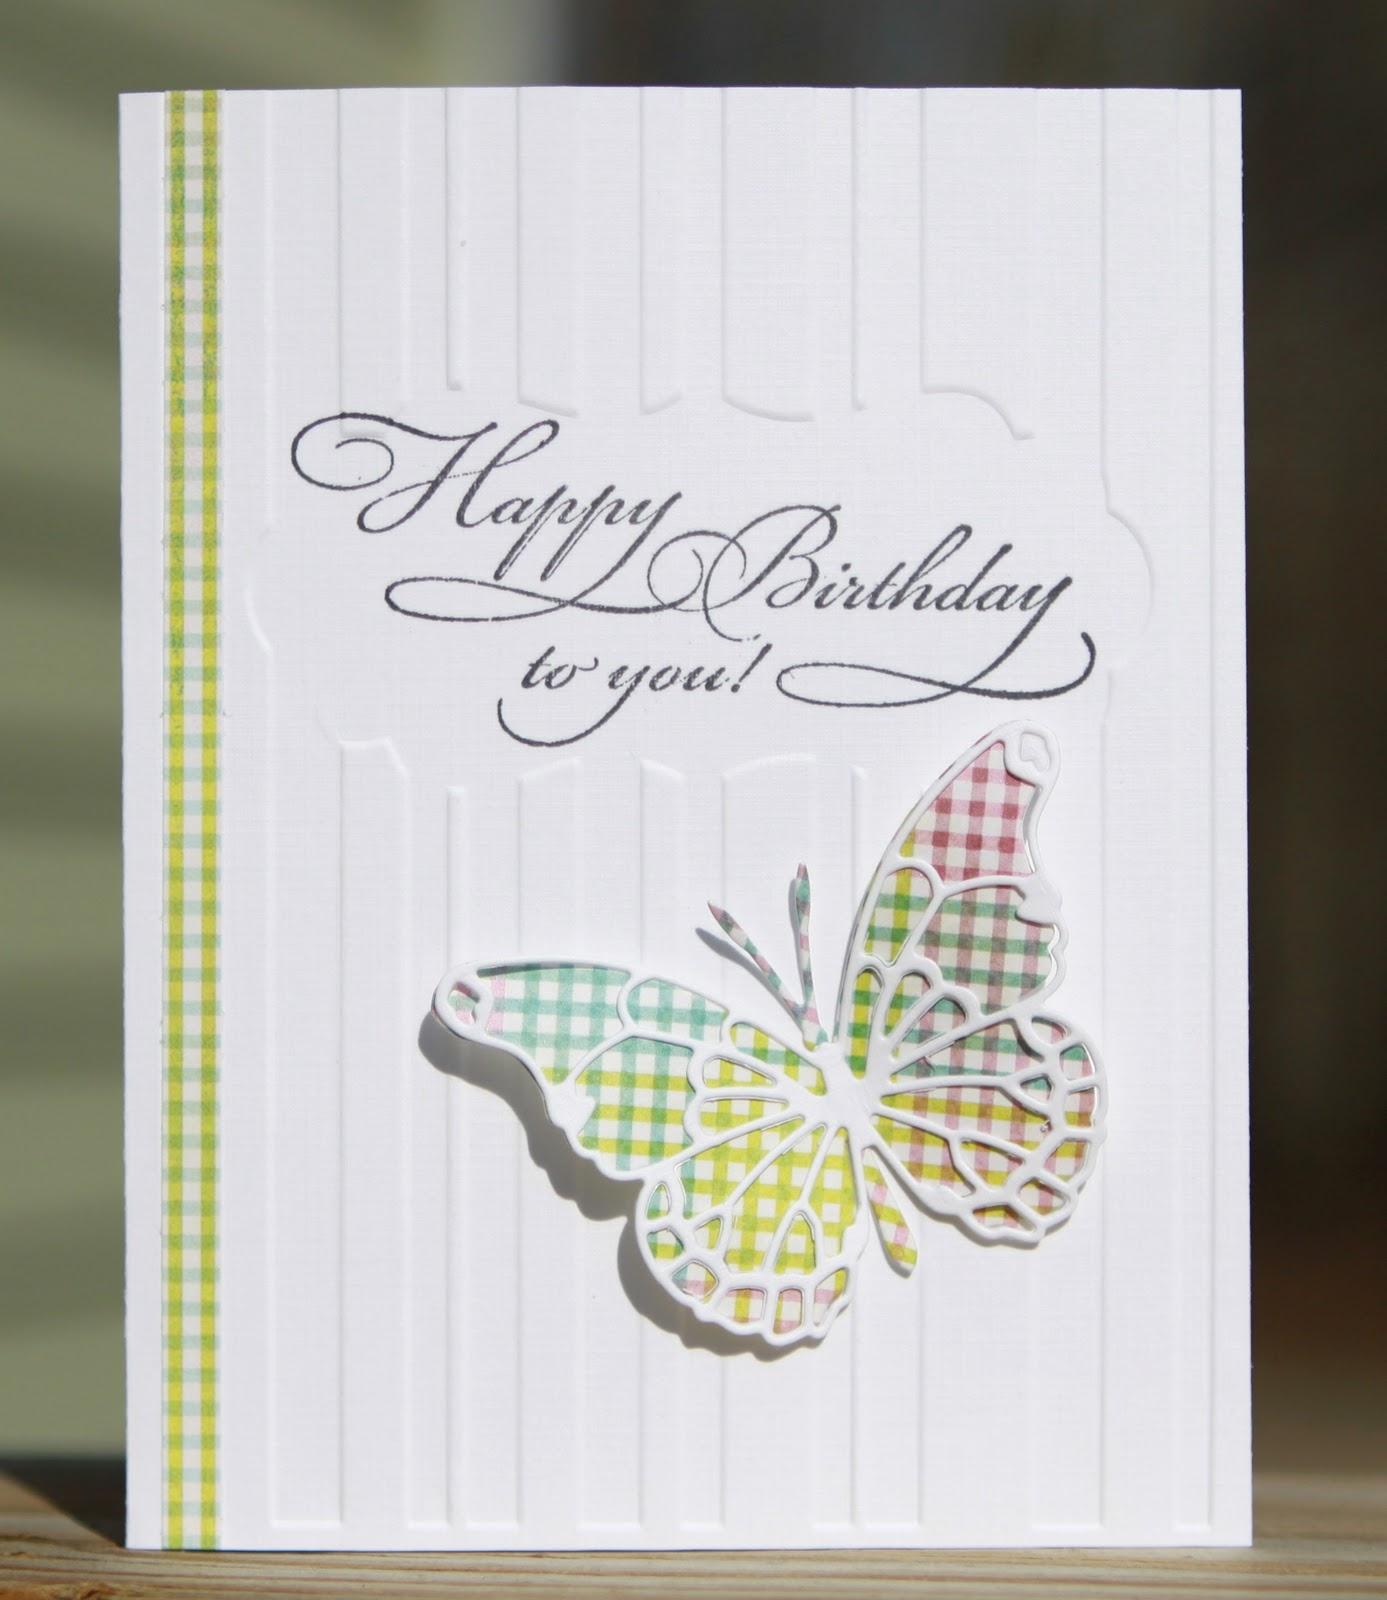 Debbie Does Crafts: Happy Birthday #4